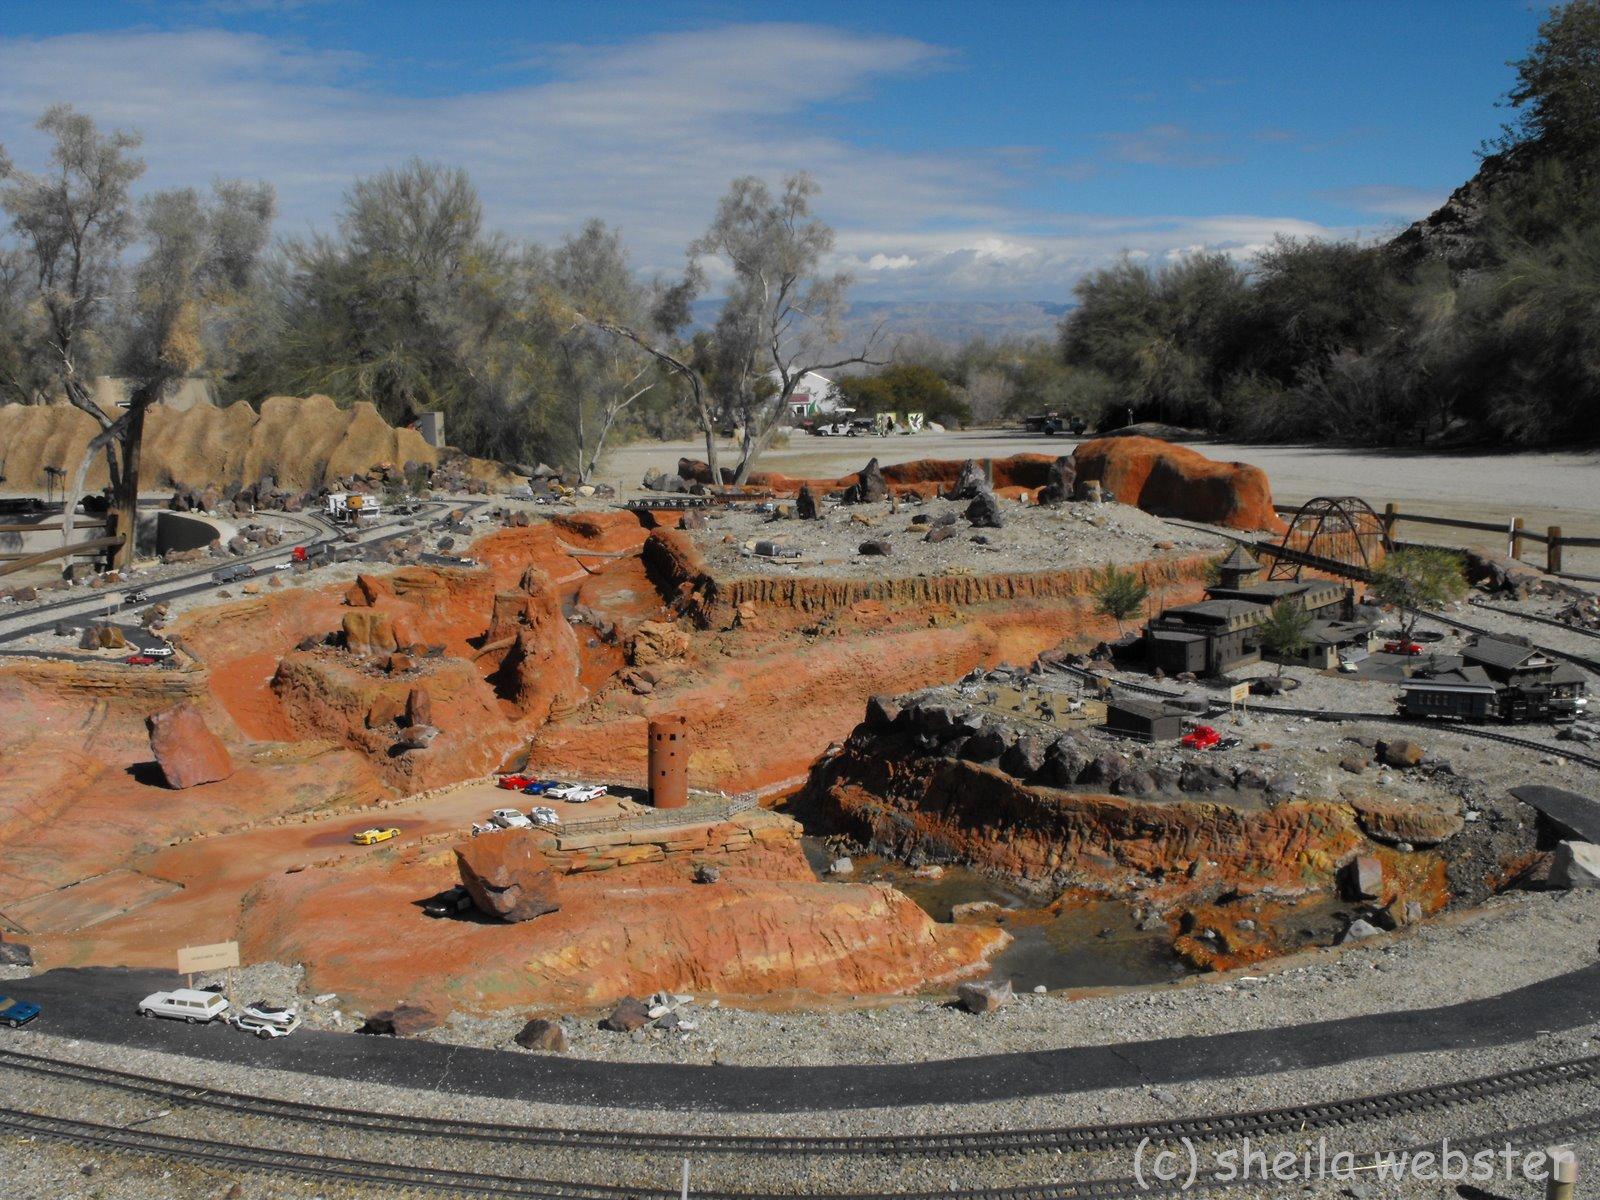 We Love RV'ing: Living Desert Zoo and Botanical Gardens ...